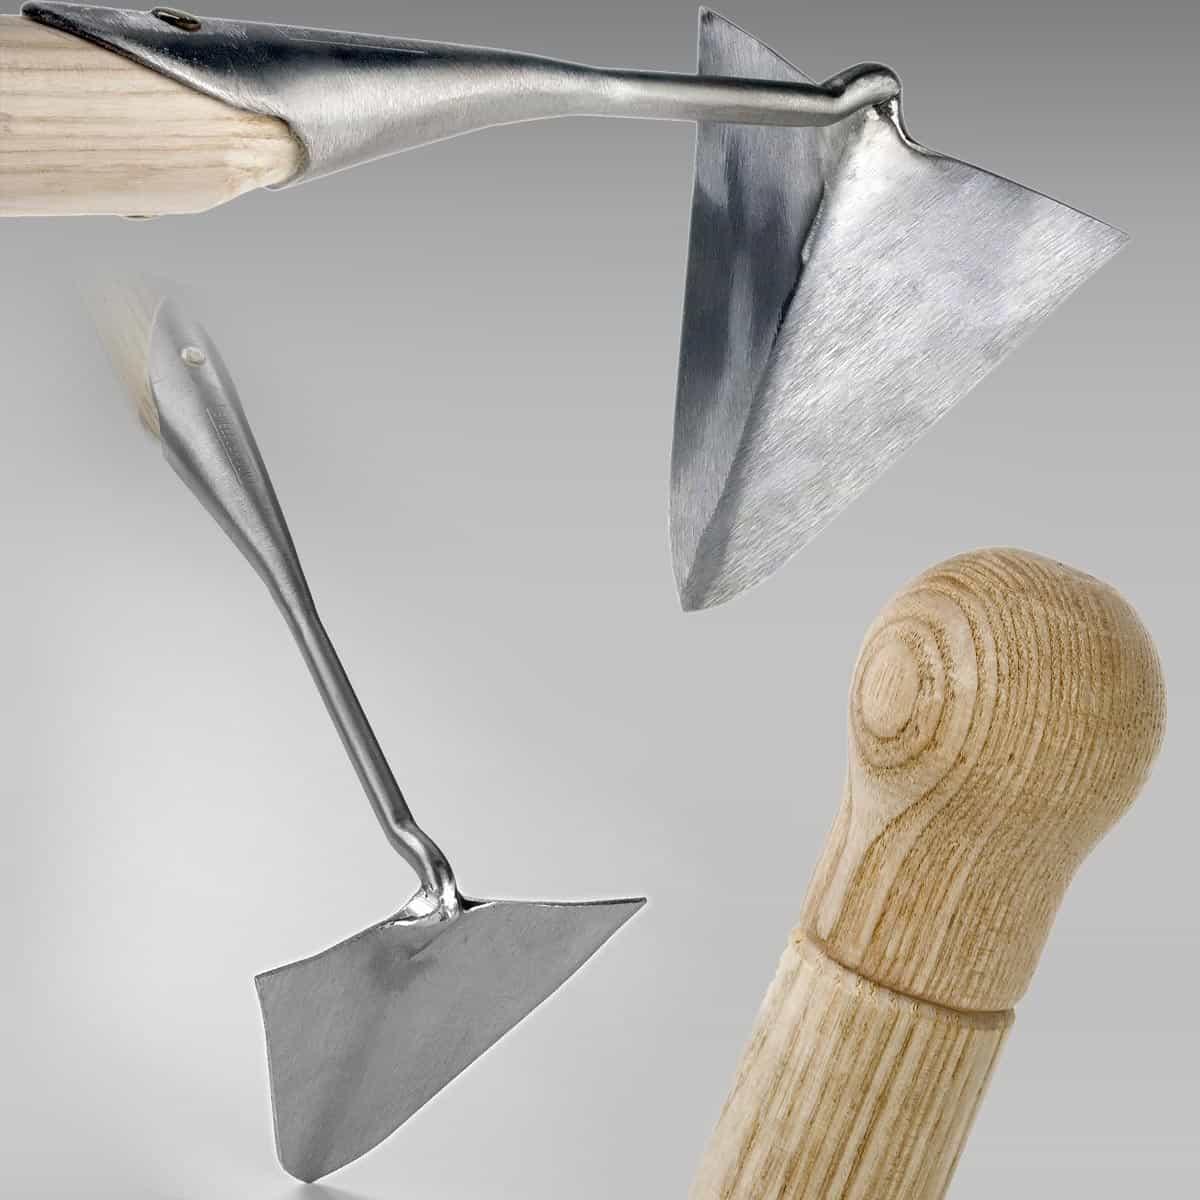 houe pointue outil hollandais sneeboer outils long manche sneeboer. Black Bedroom Furniture Sets. Home Design Ideas